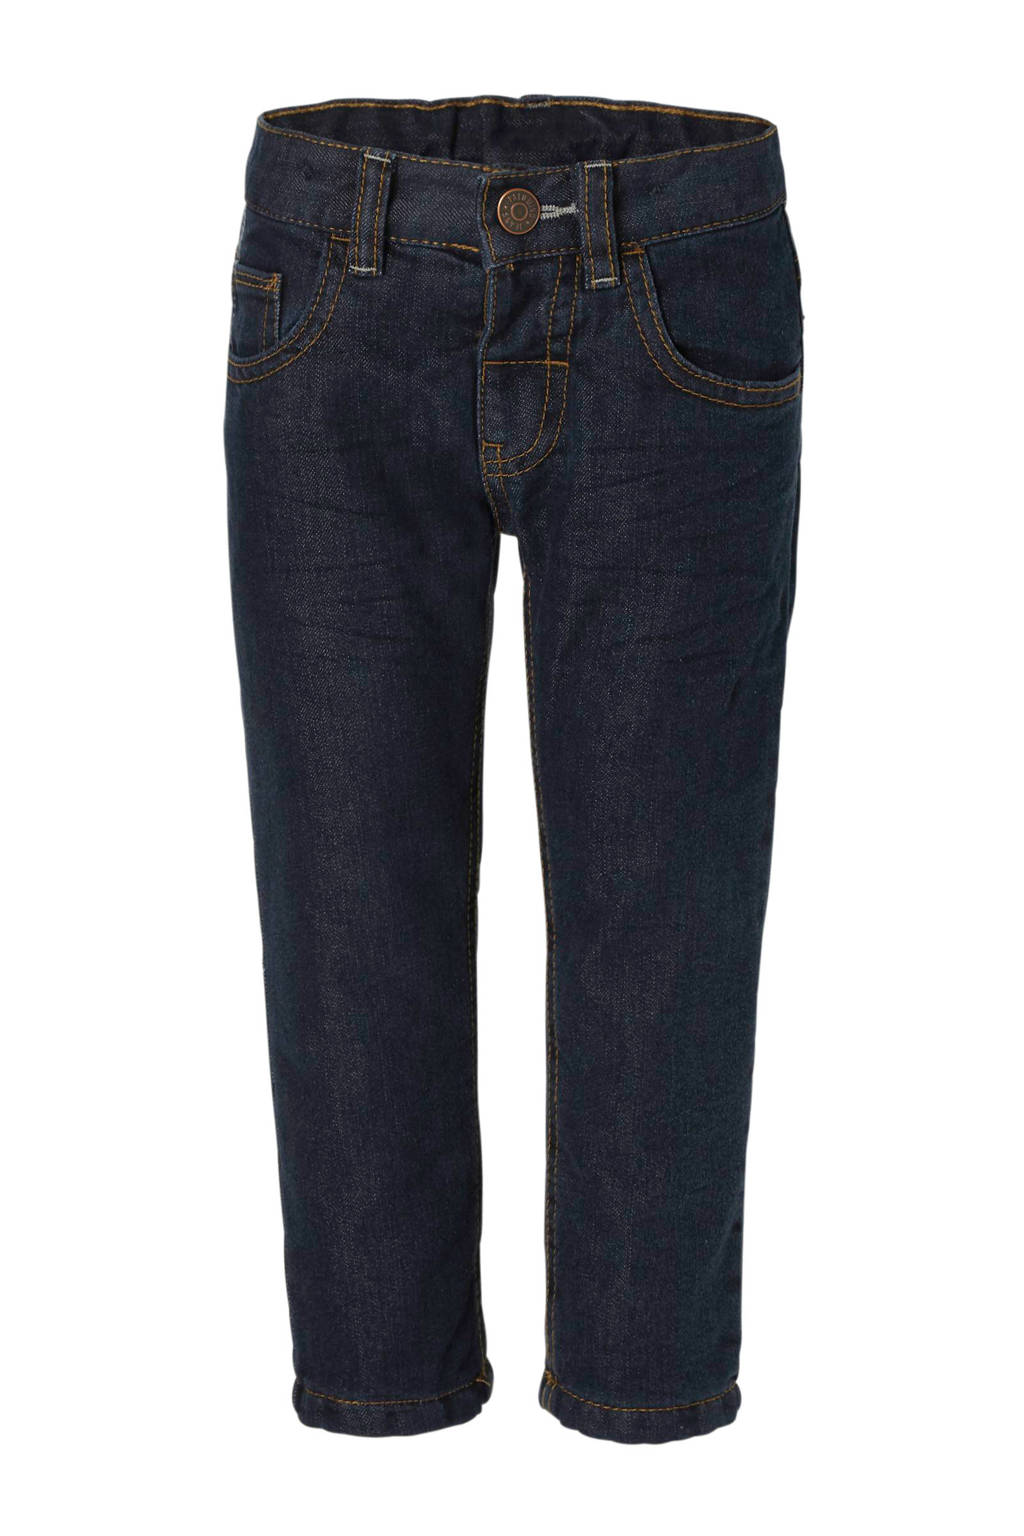 C&A Palomino slim fit thermo jeans, Dark denim